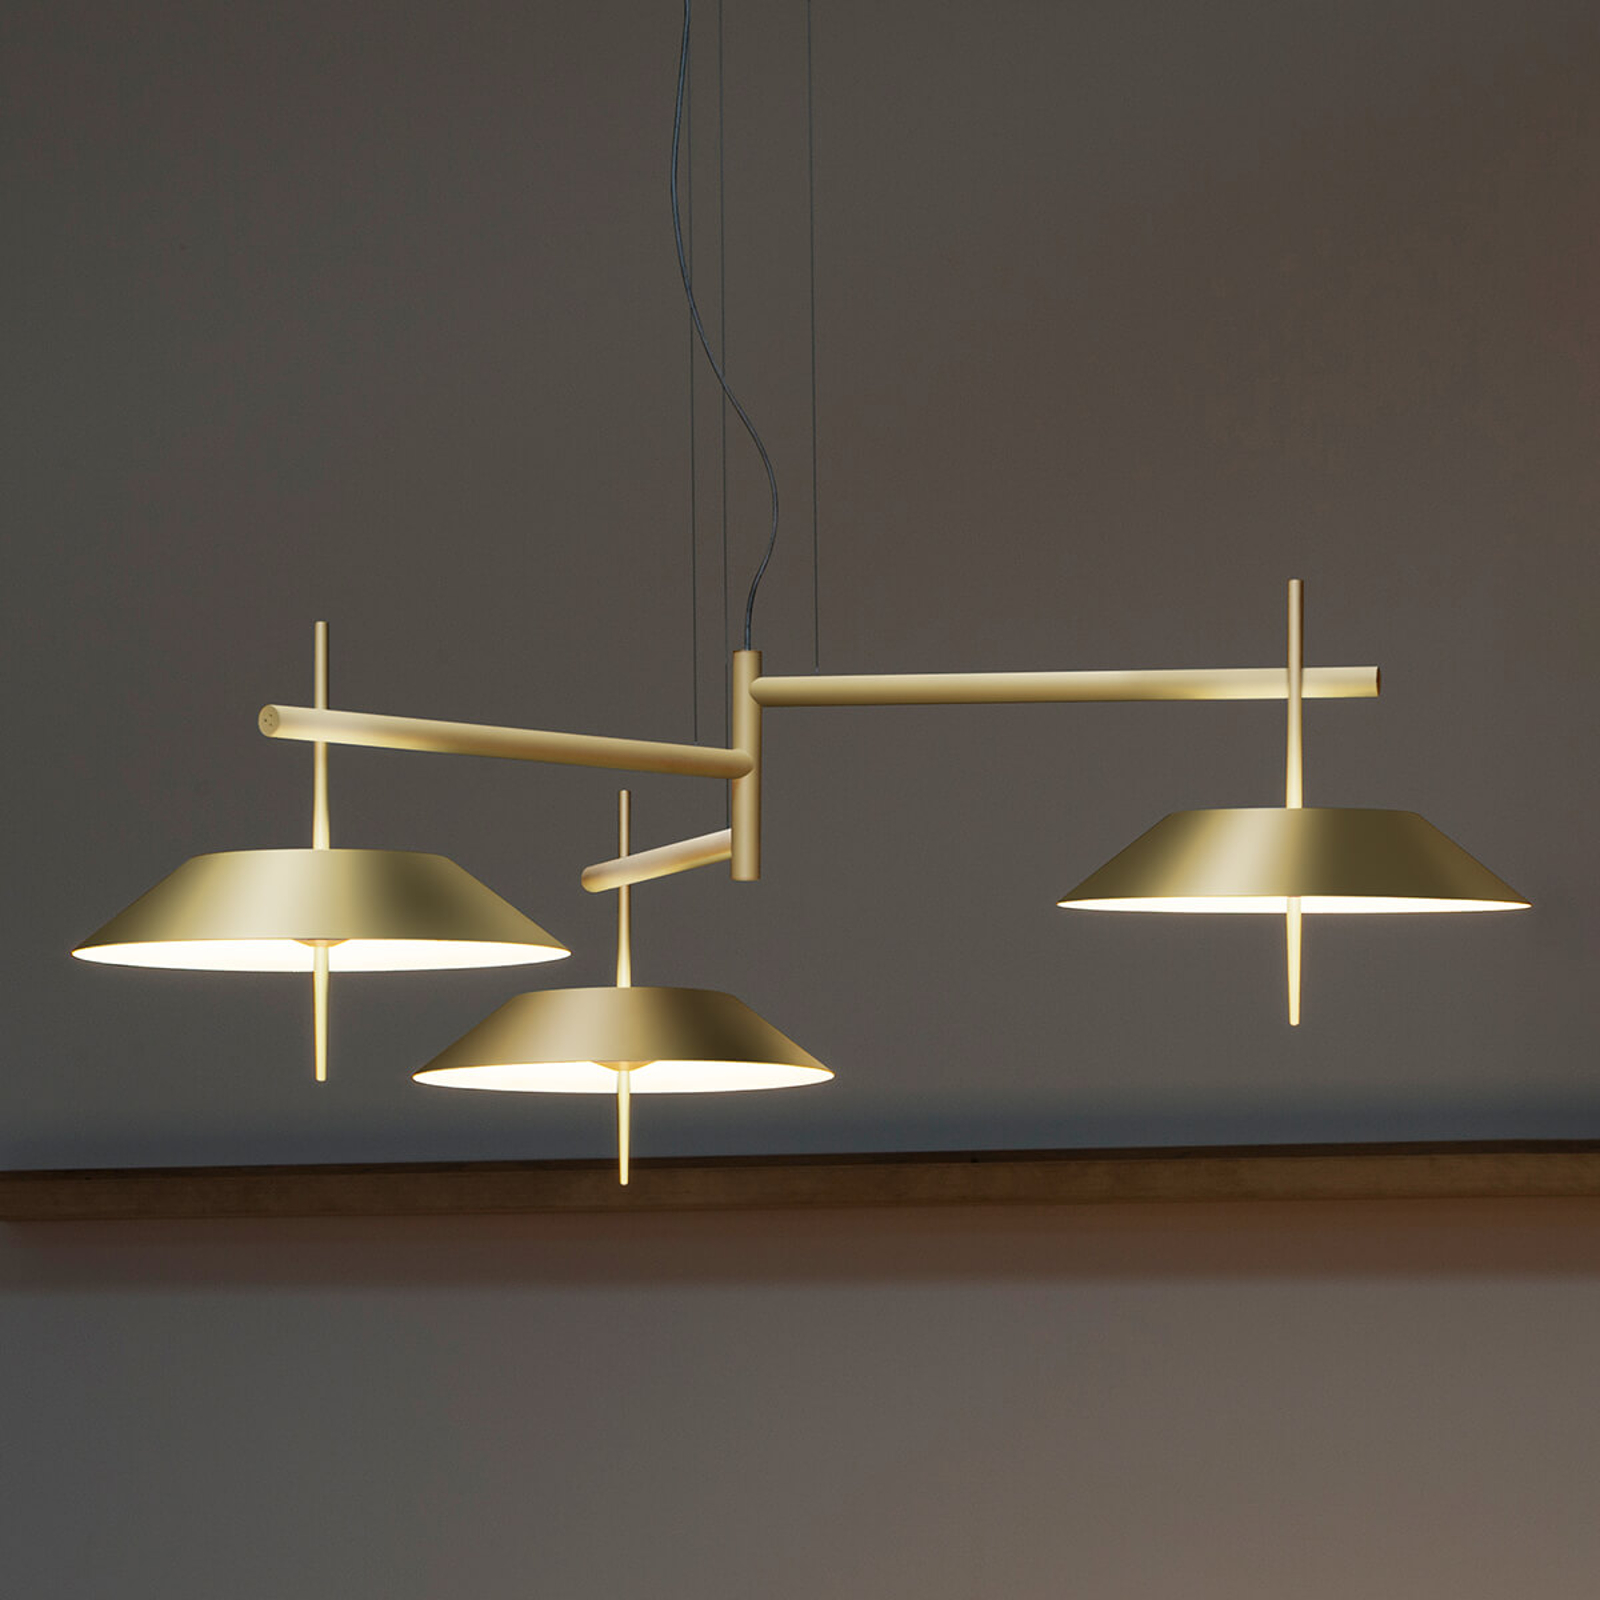 Designerska lampa wisząca LED Mayfair, 3-punktowa